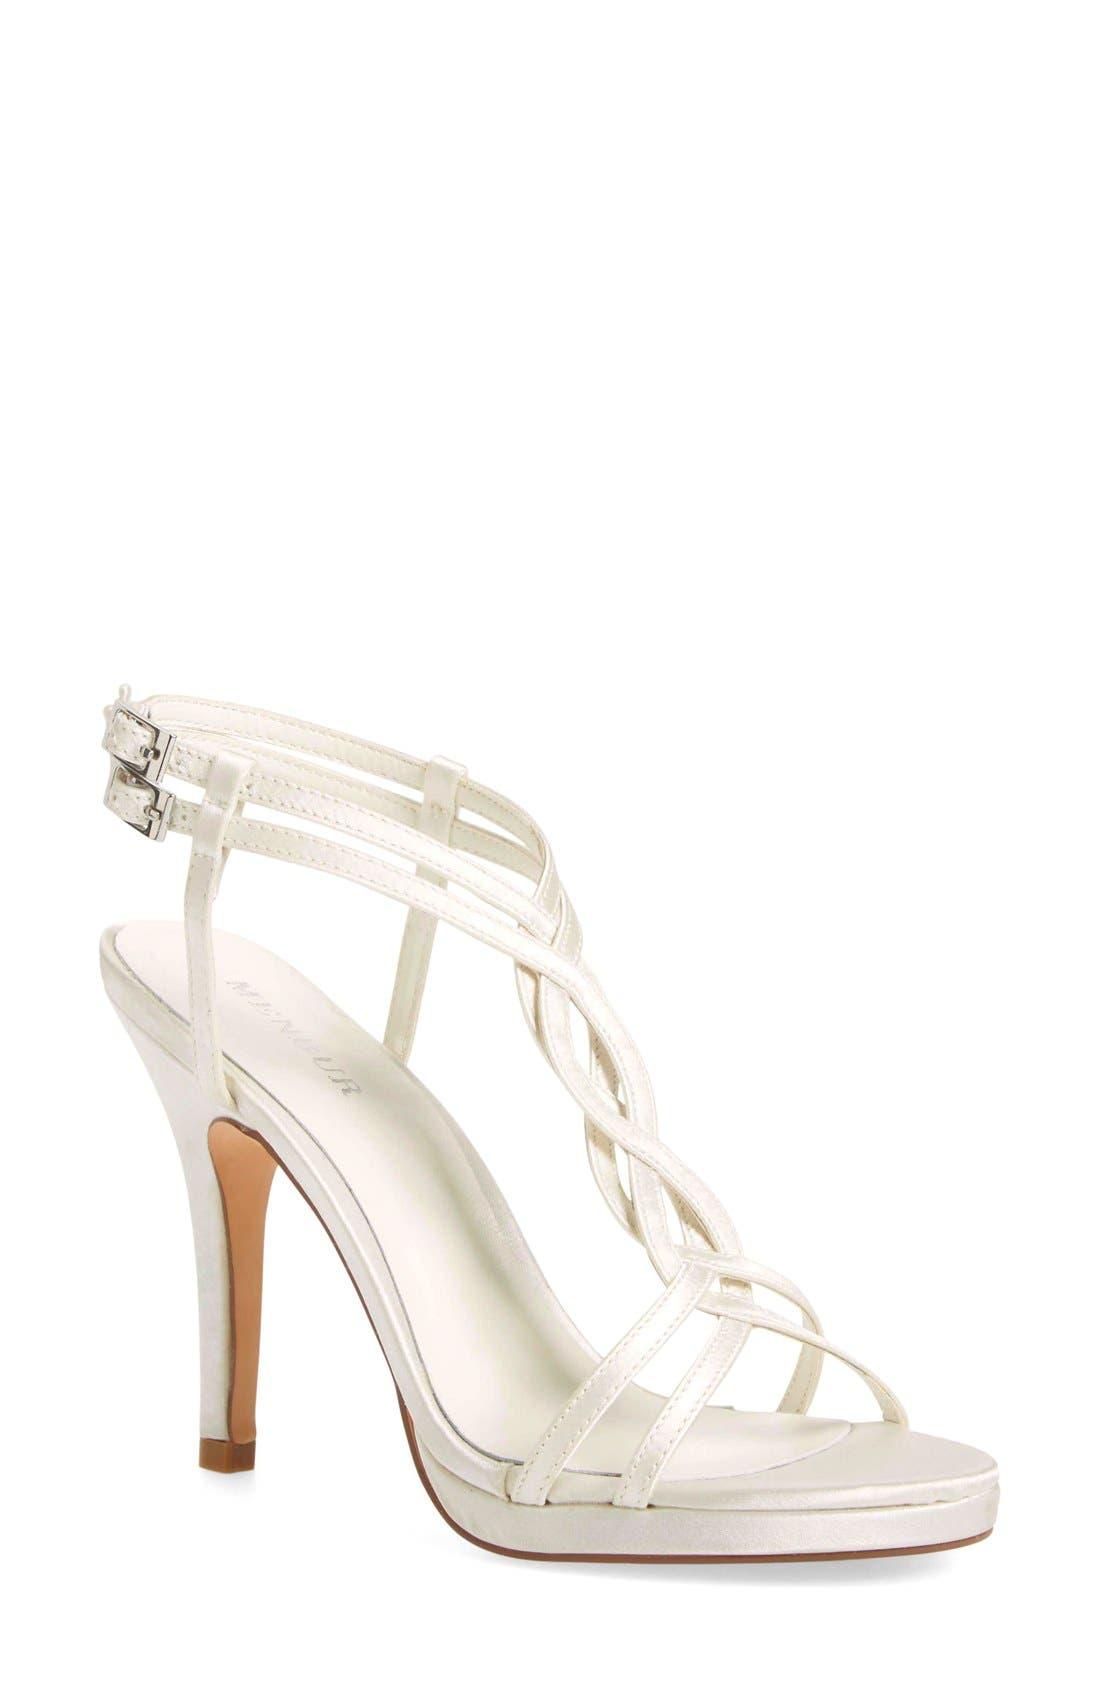 MENBUR 'Concep' Bridal Sandal